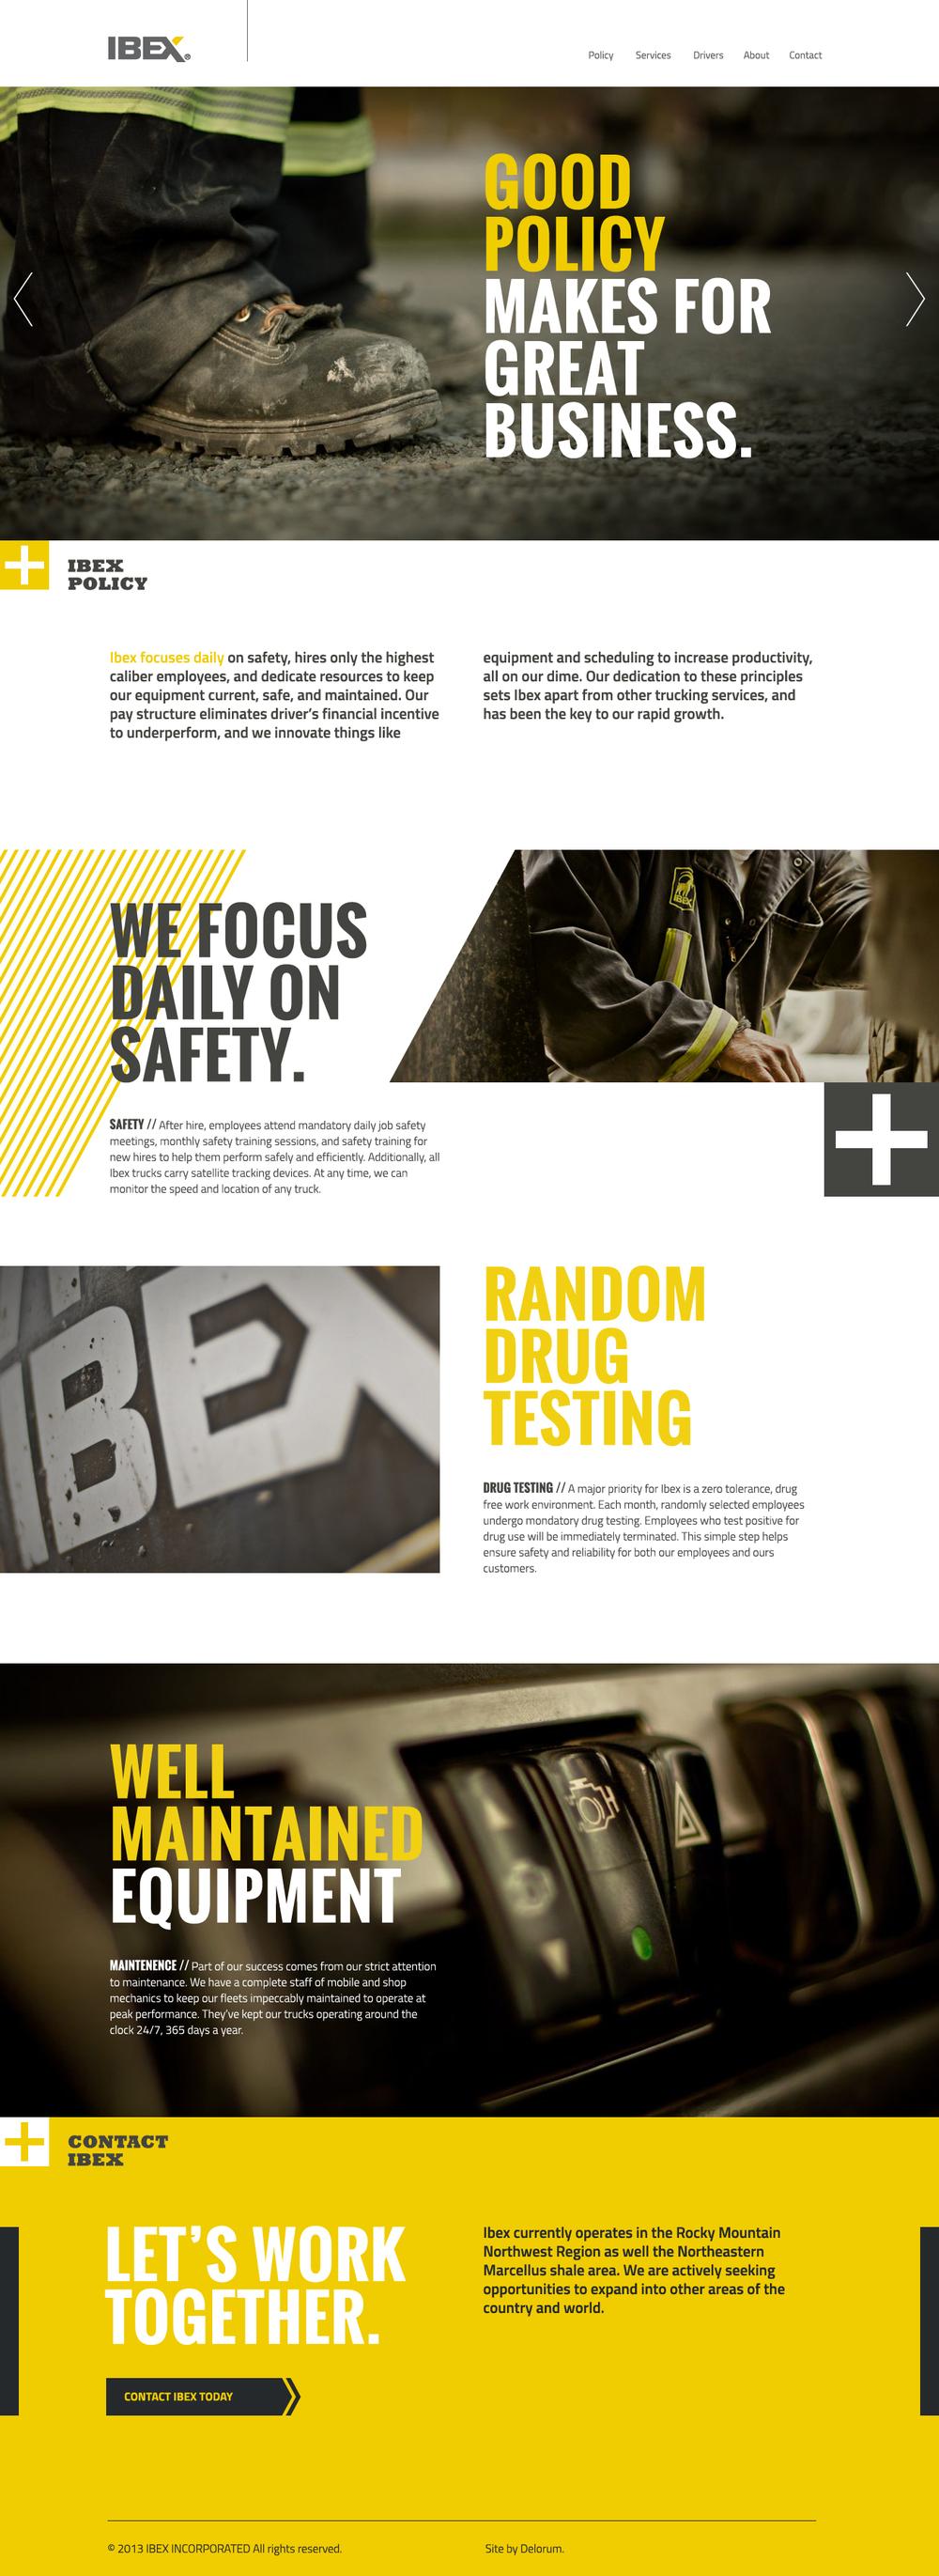 ibex_web-policies.jpg